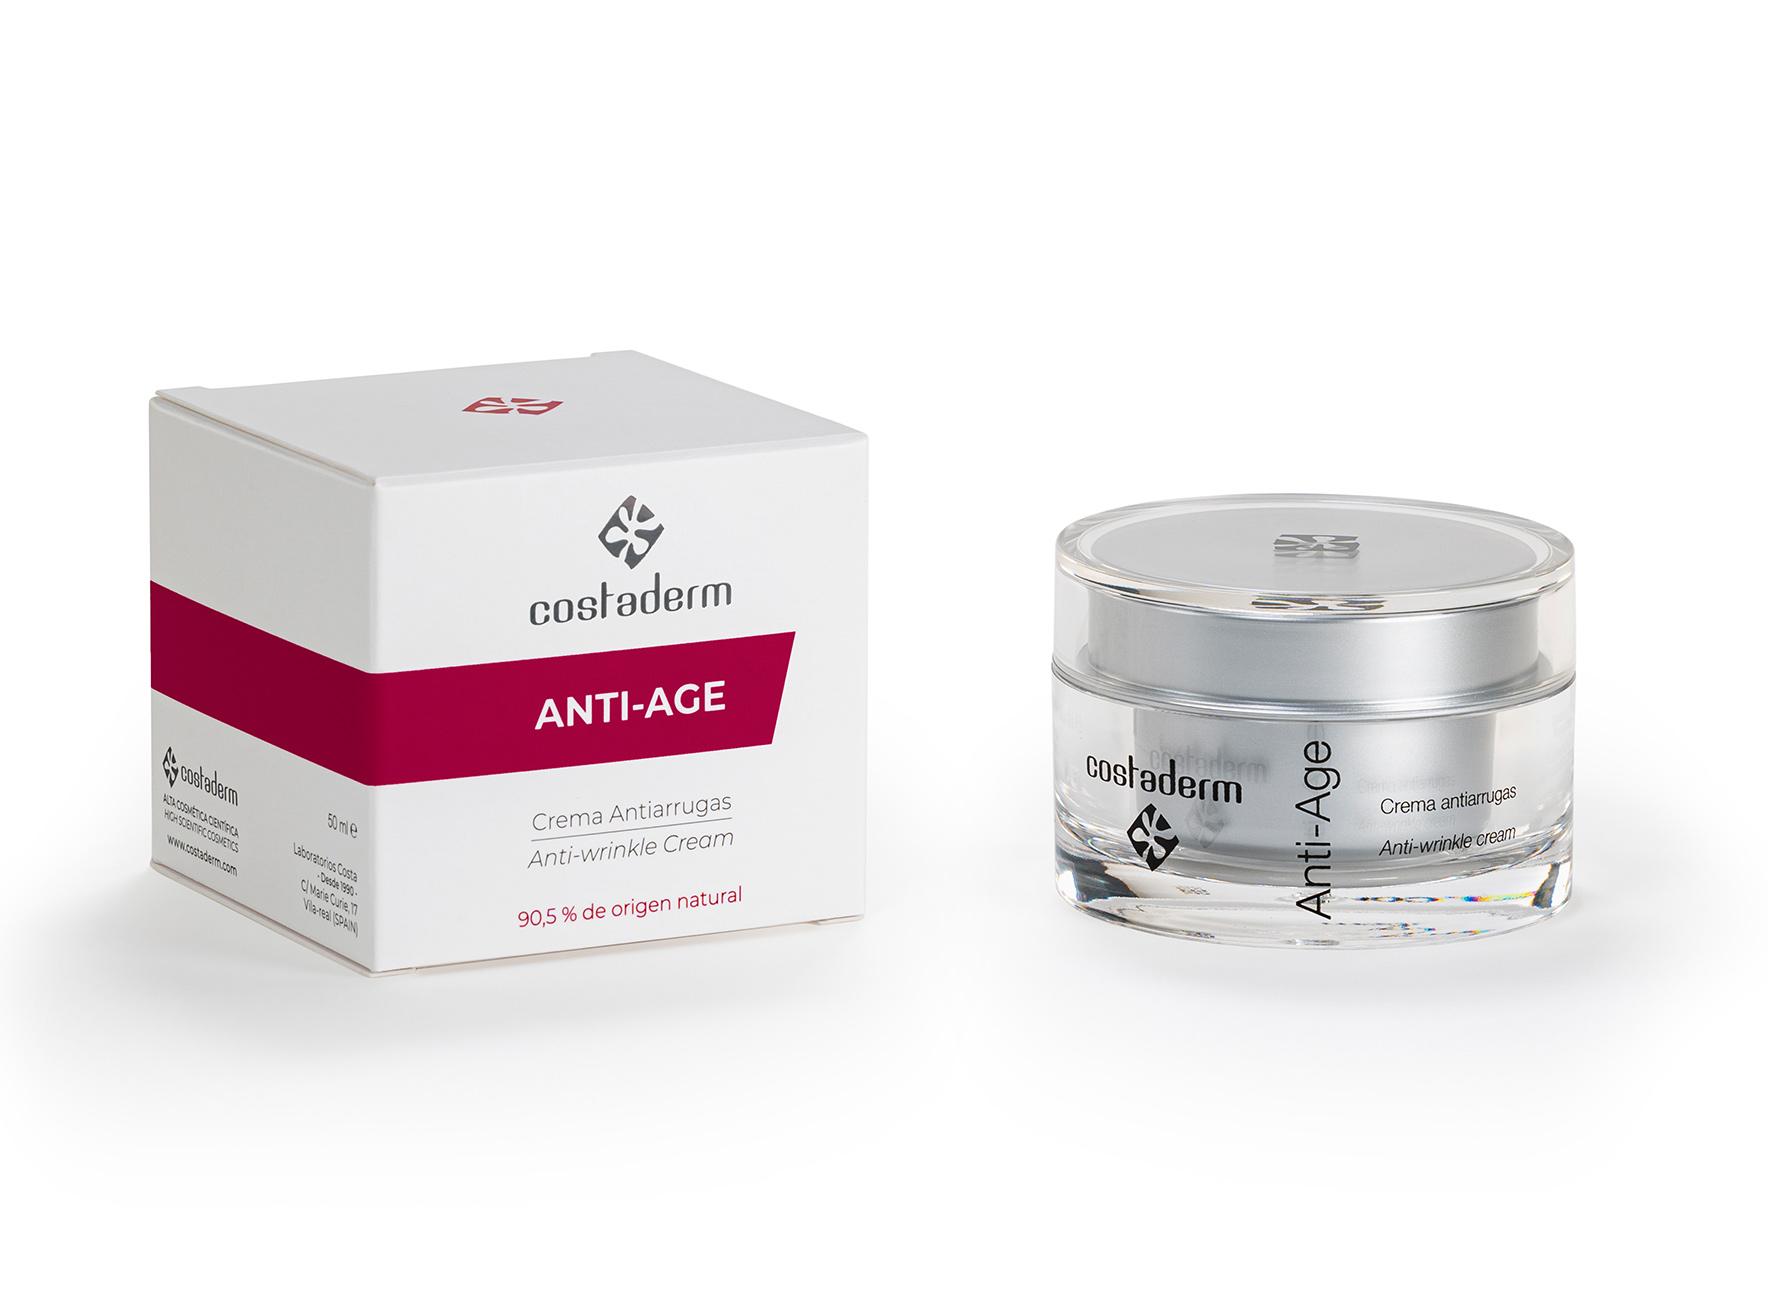 crema-antiage-costaderm